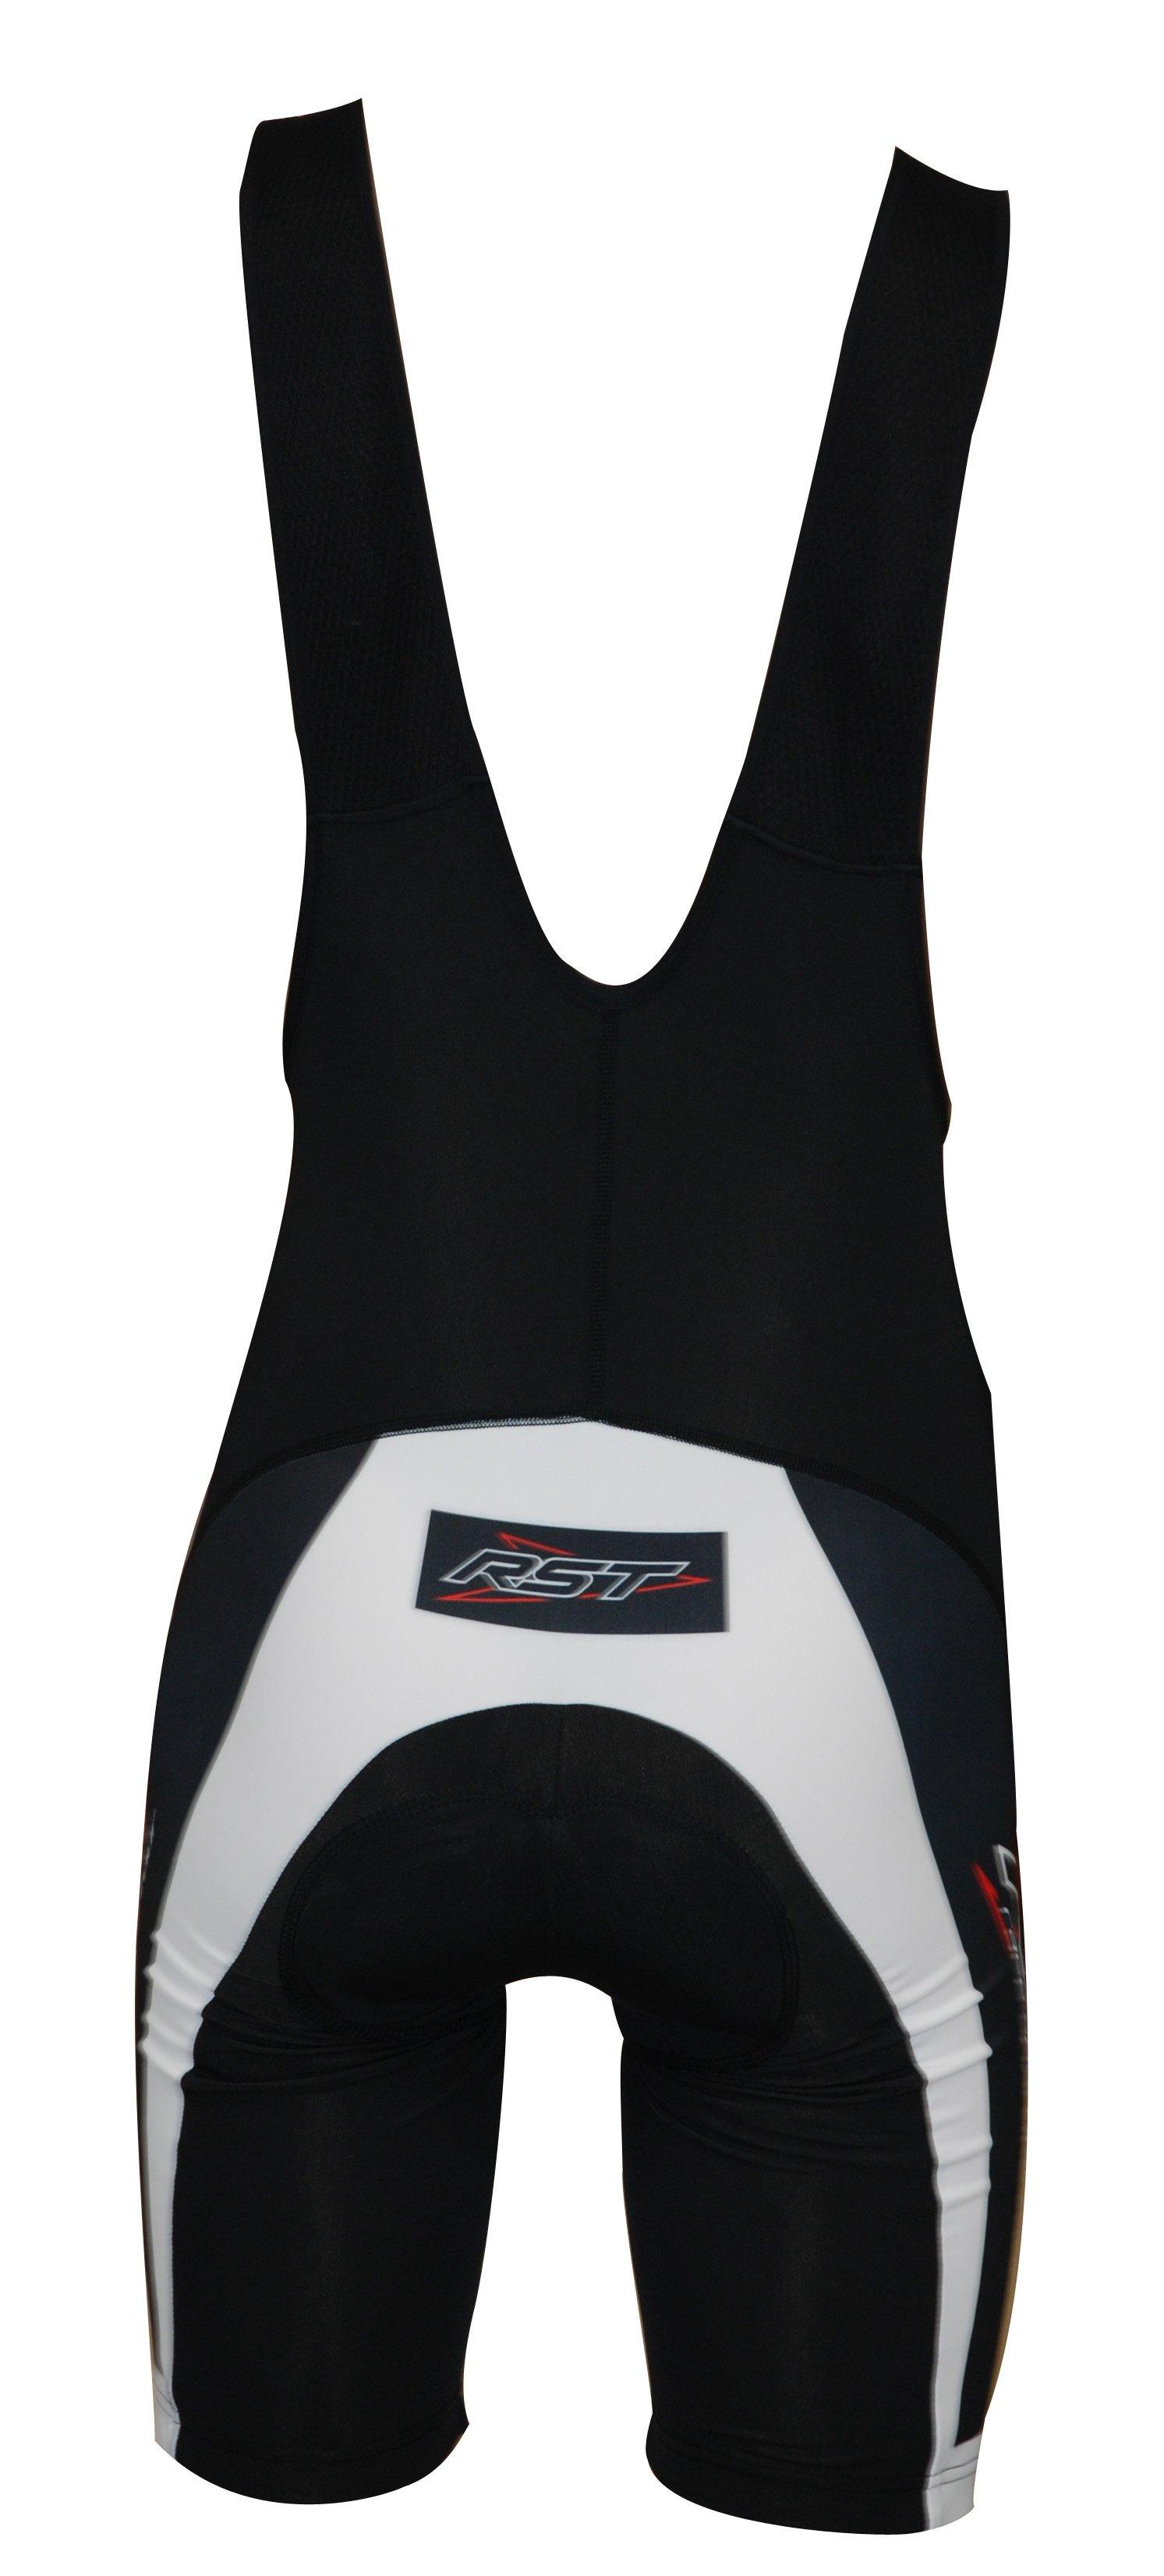 Rst Premium Line 0151 Bib Shorts Cycle Division Uk